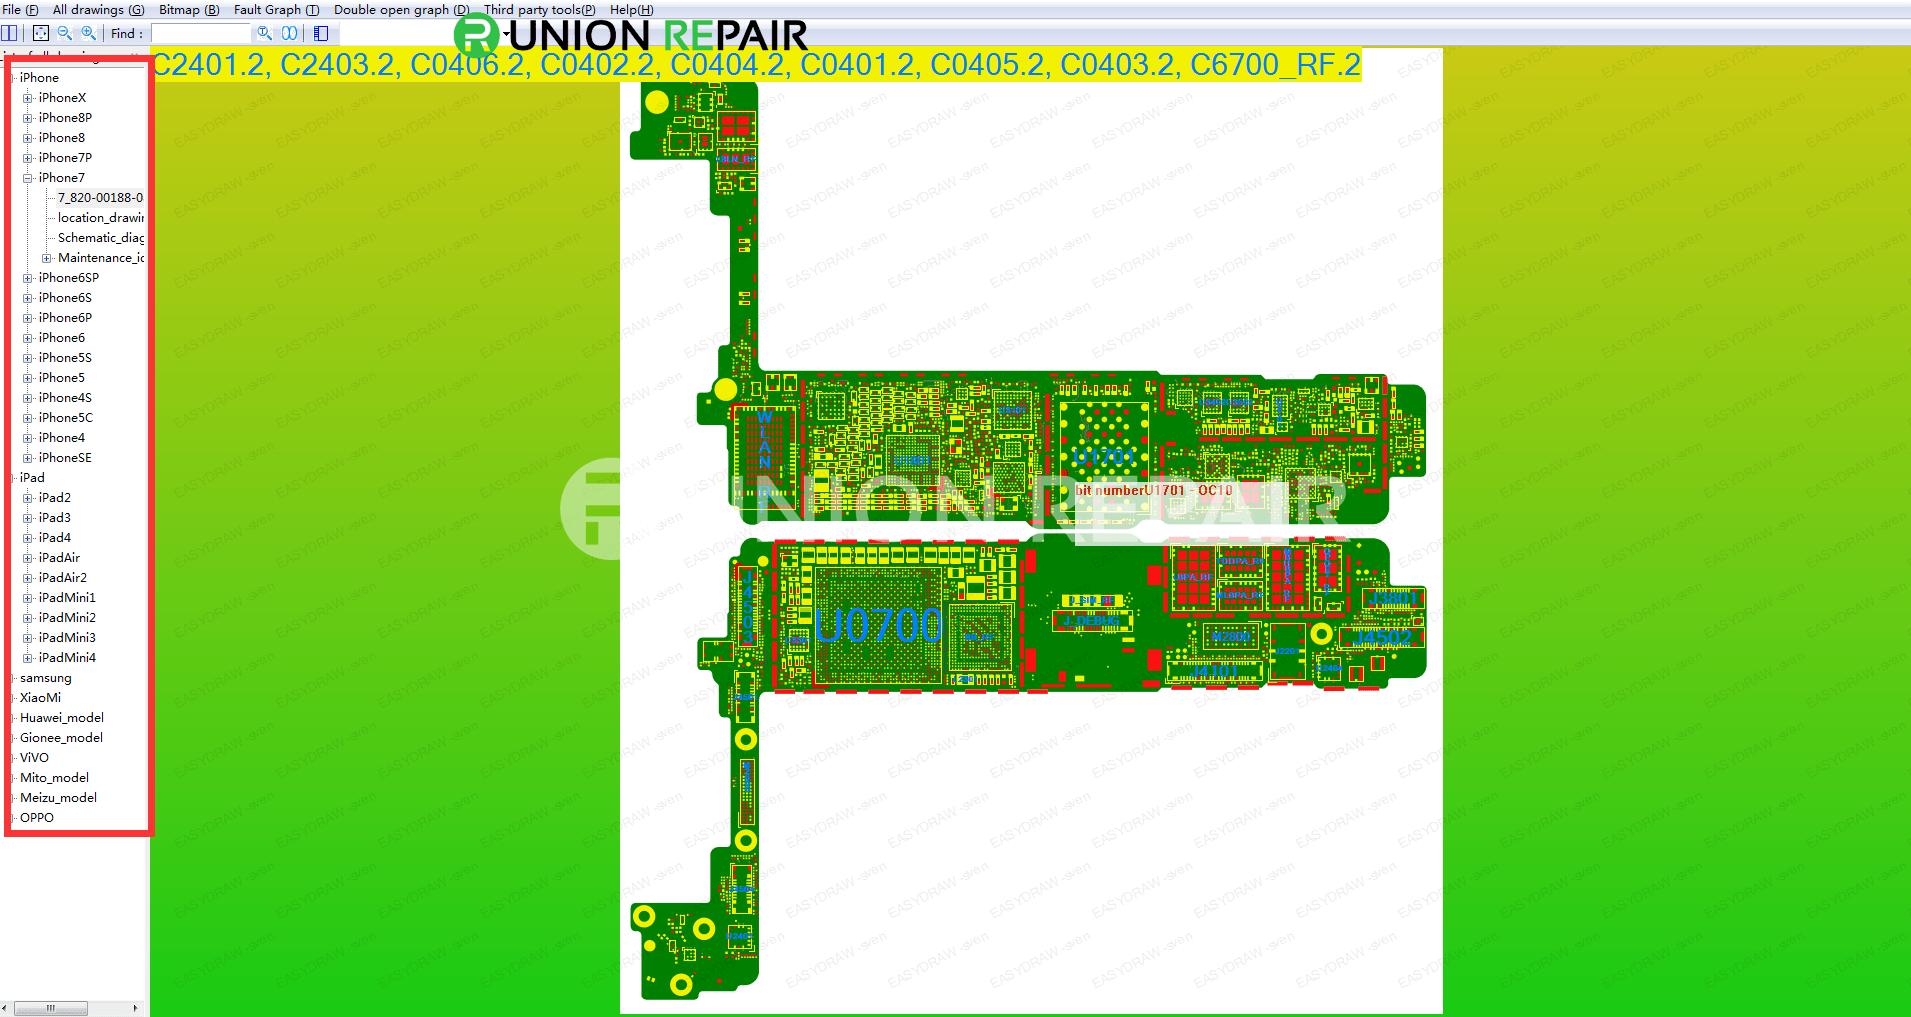 medium resolution of easy draw smartphone schematic diagrams zxw alternative 1 year electrical diagram schematic symbols ed1 min